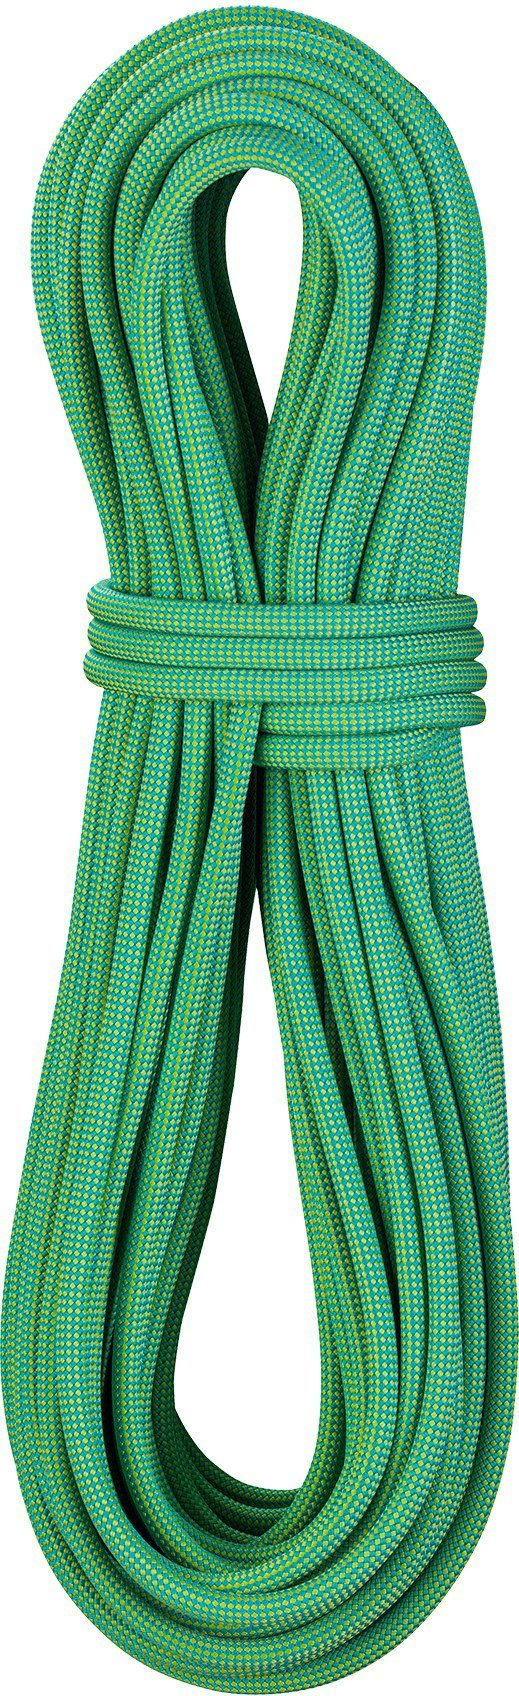 Edelrid Kletterseil »Eagle Lite Pro Dry Rope 9,5mm 60m«